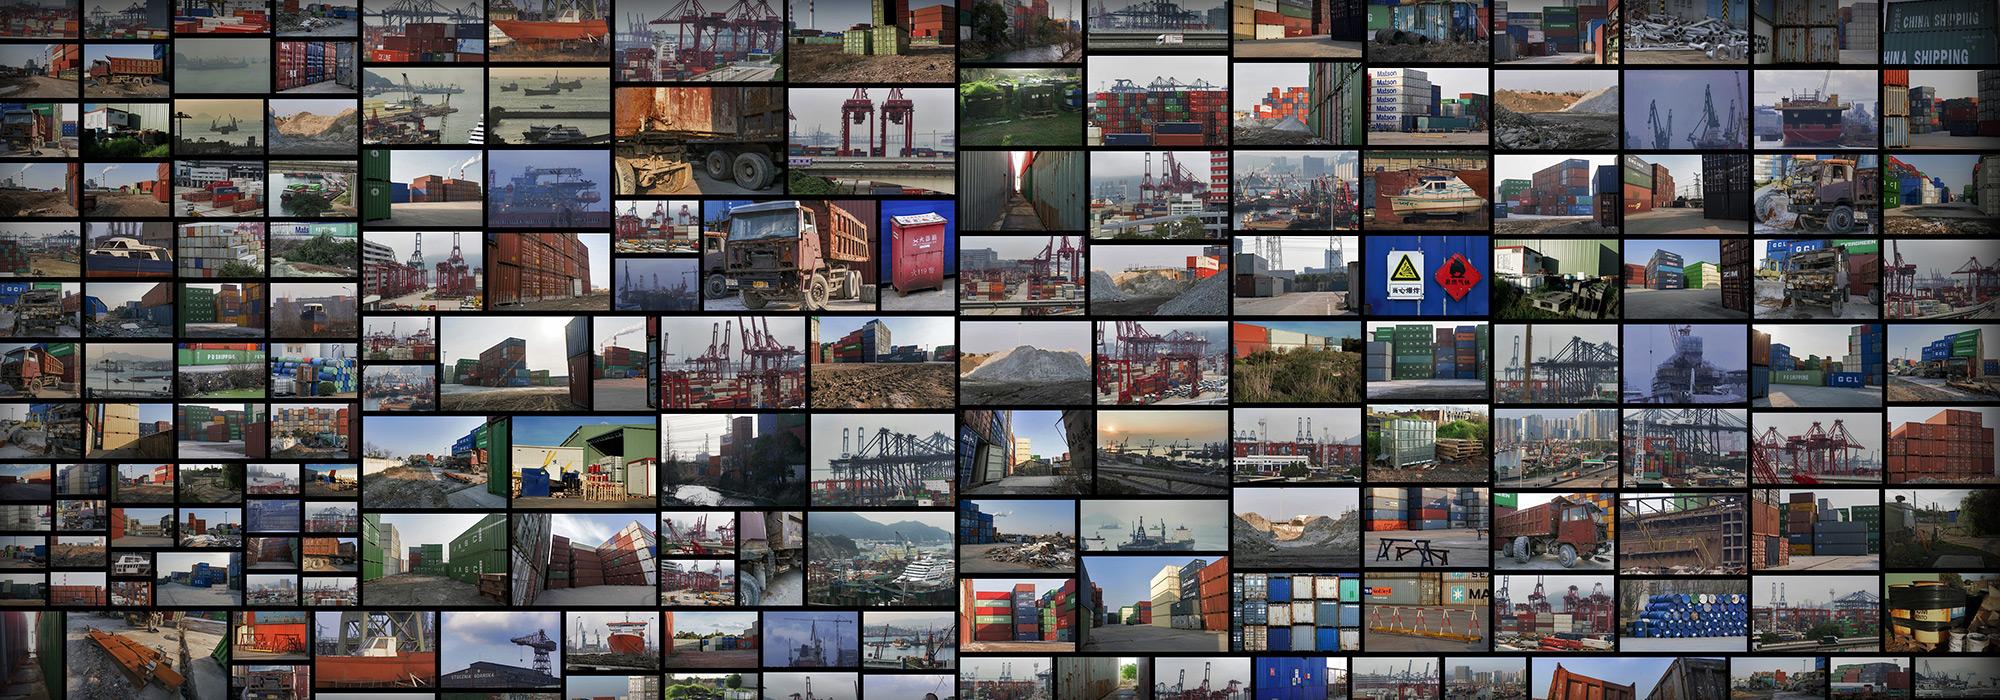 ShippingContainersHarbourDocks